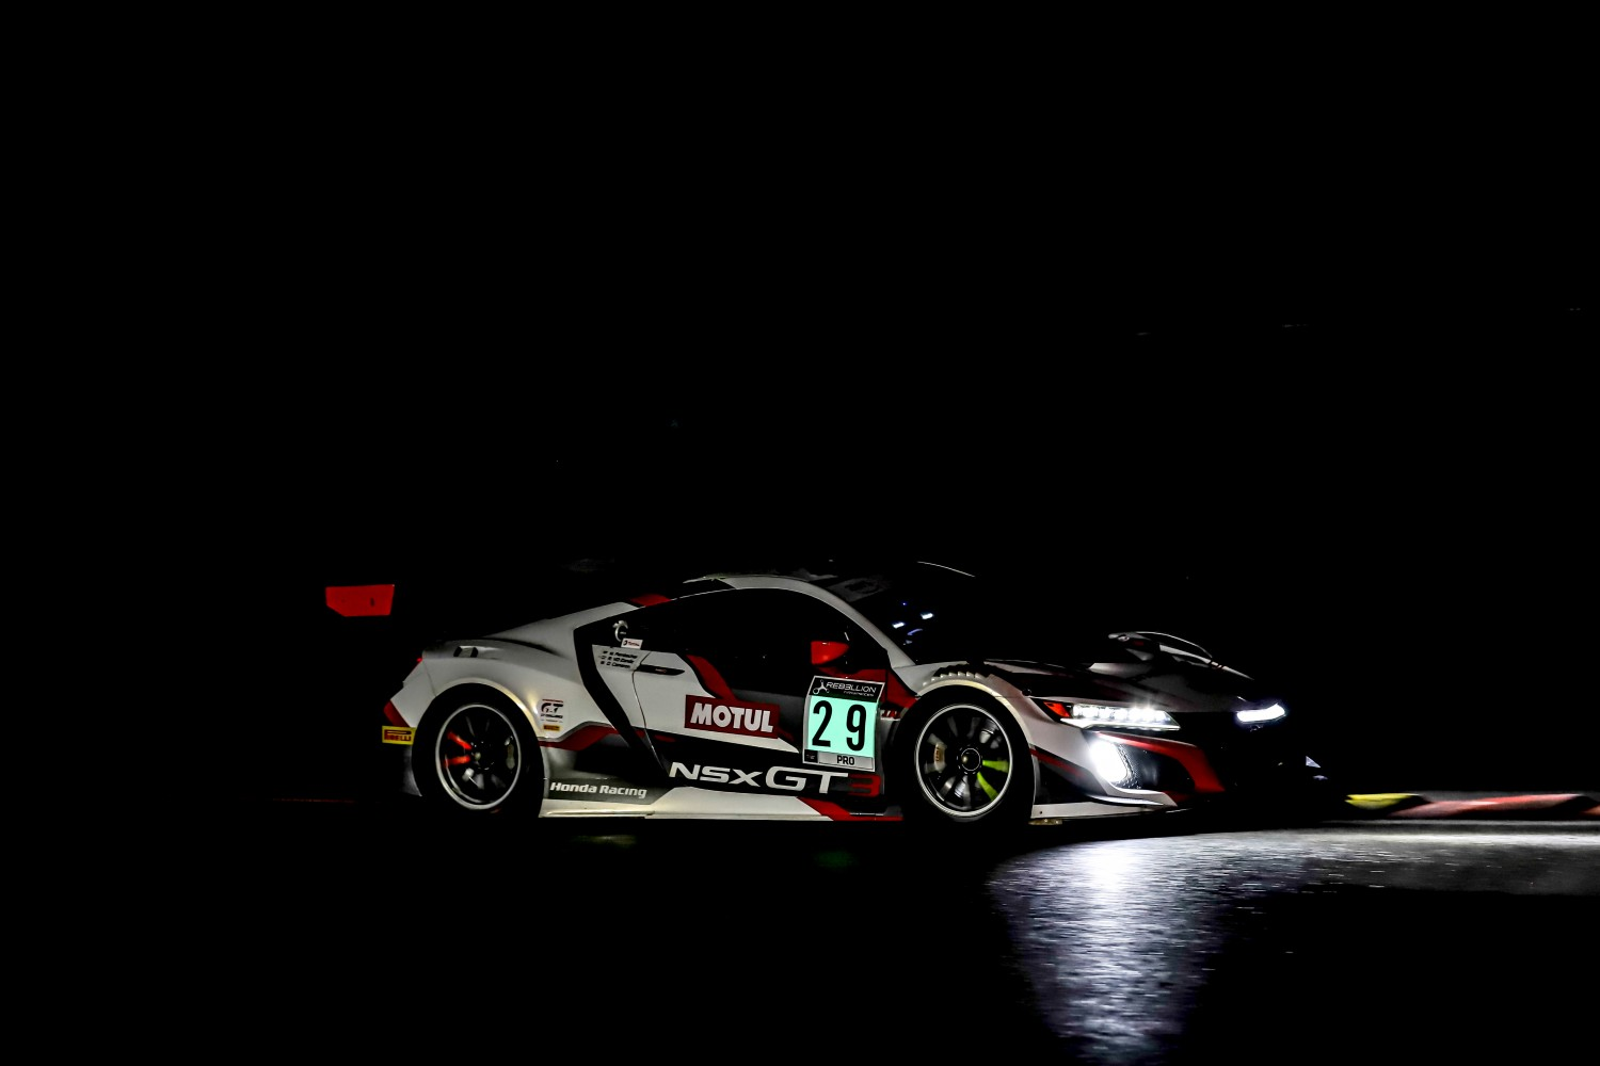 #29 Team Honda Racing ITA- Dane Cameron USA Renger  van der Zande NDL Mario Farnbacher DEU IGTC, Night Practice